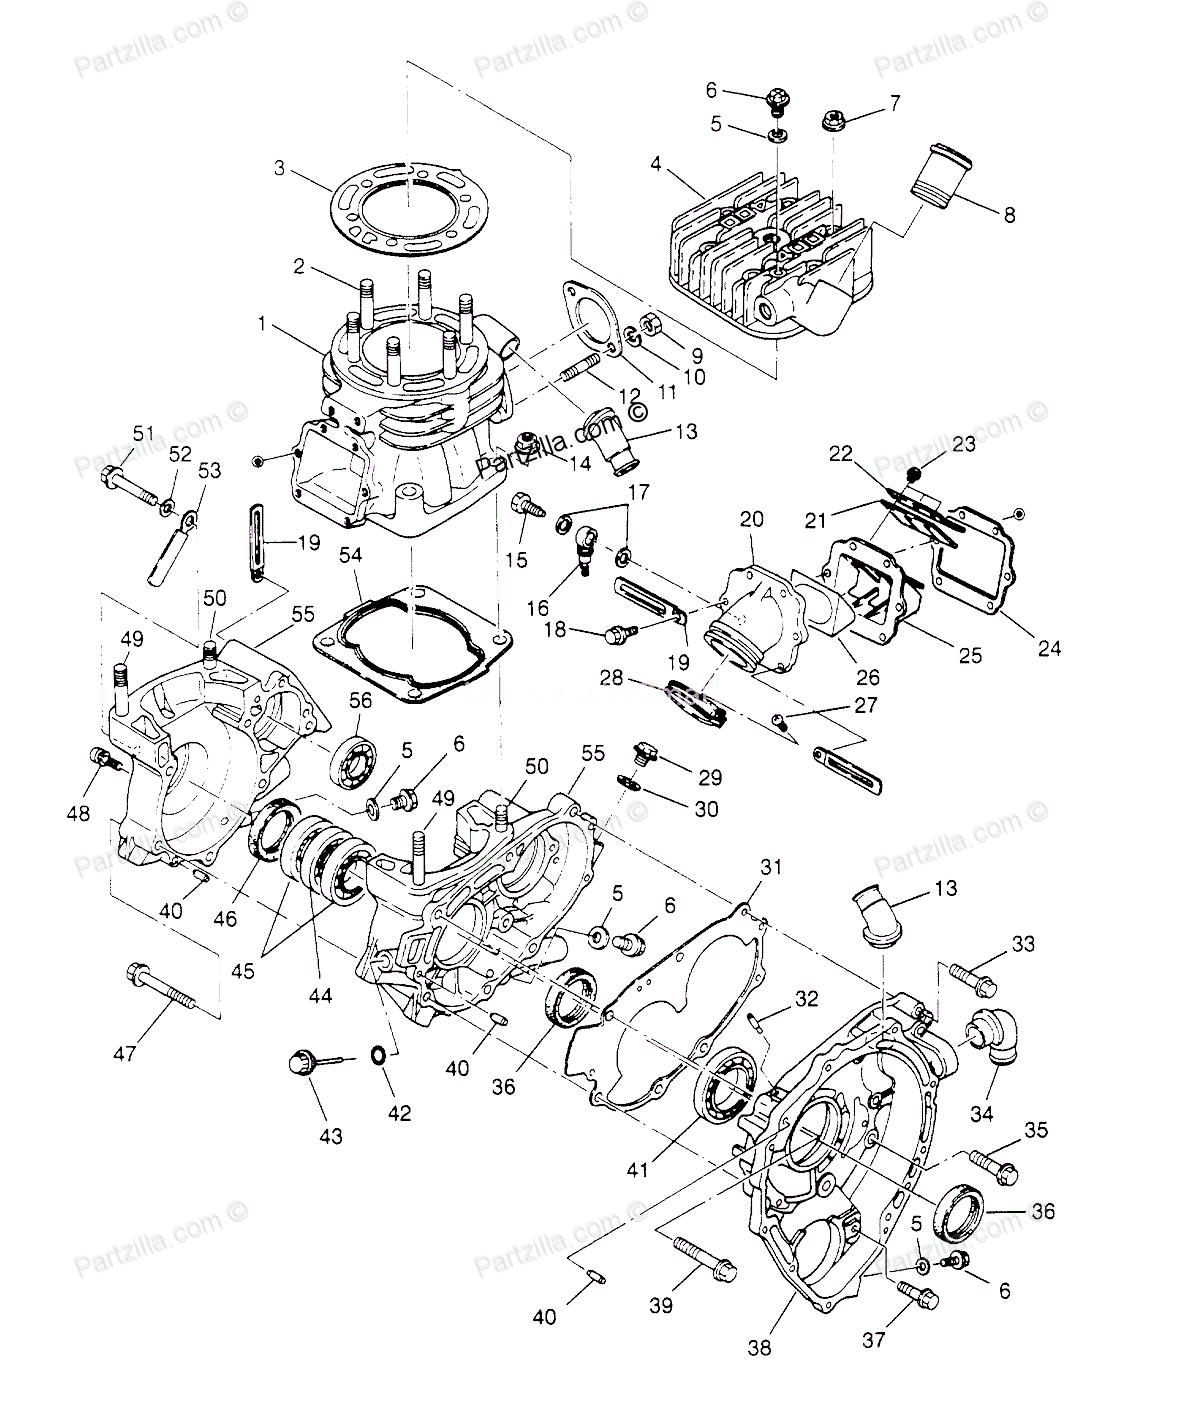 Scrambler 400 Oily Exhaust